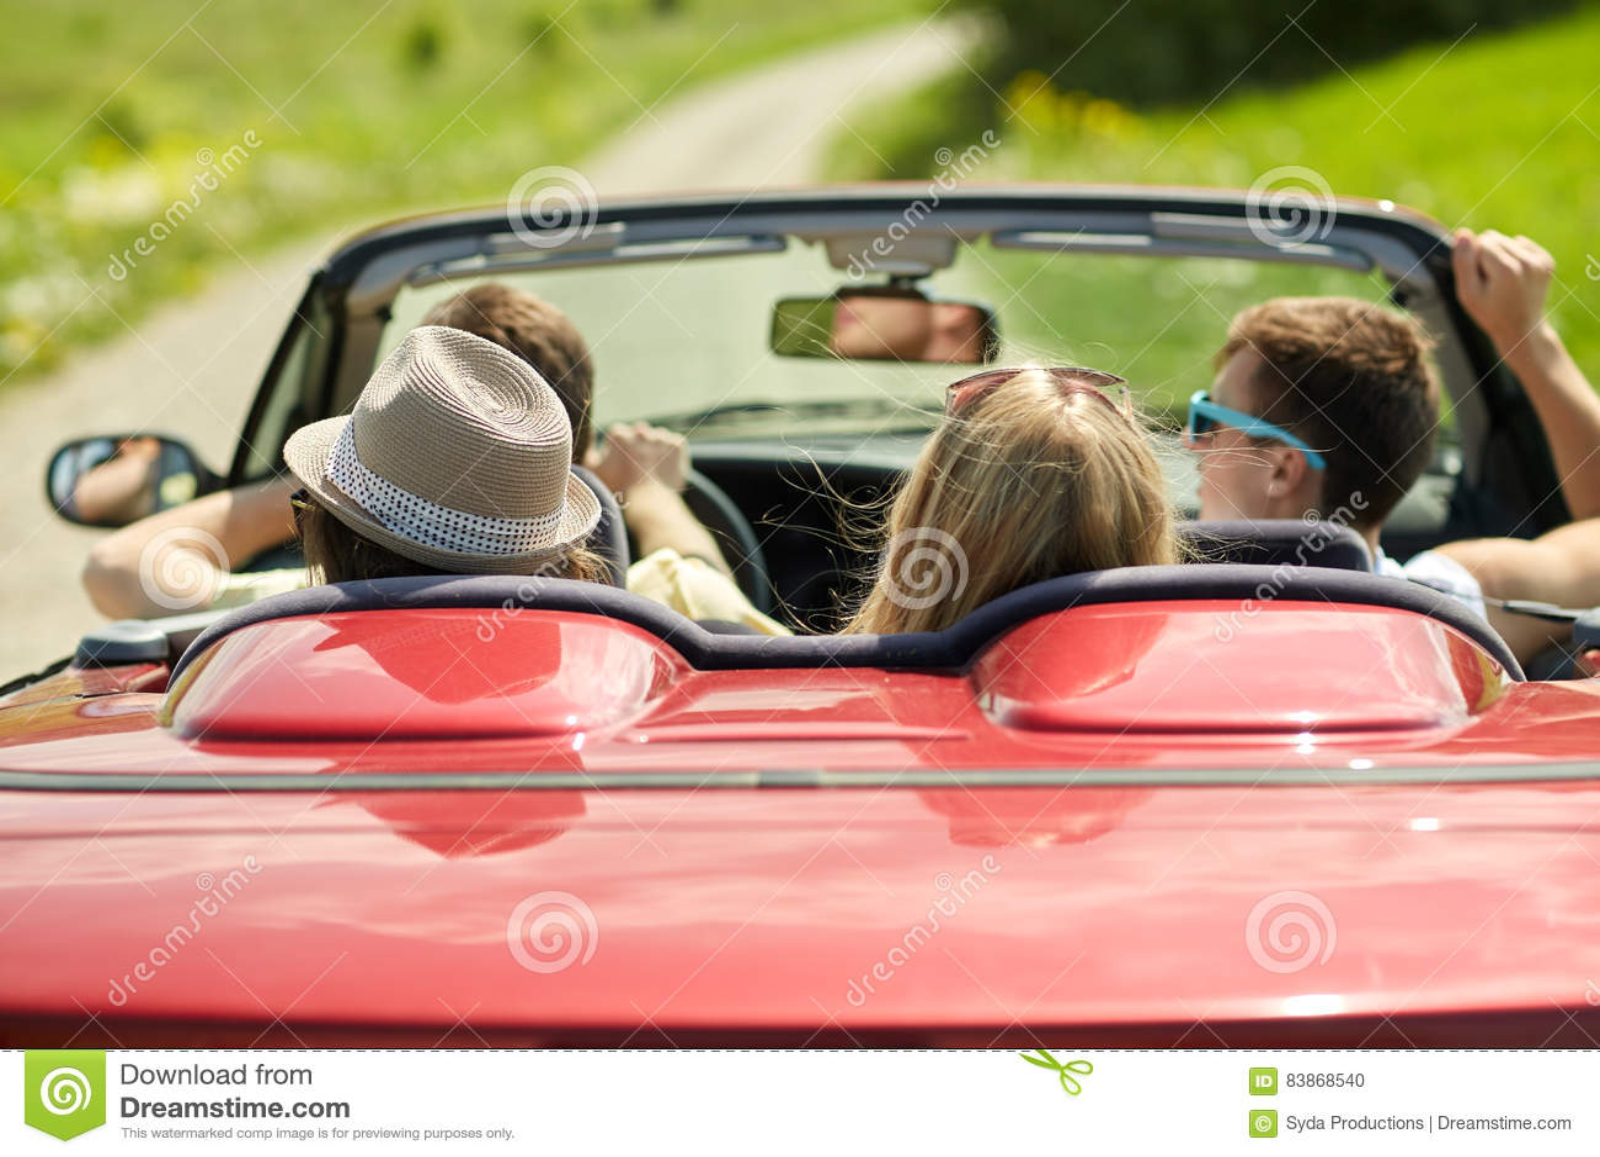 Driving A Rental Car For Road Trip